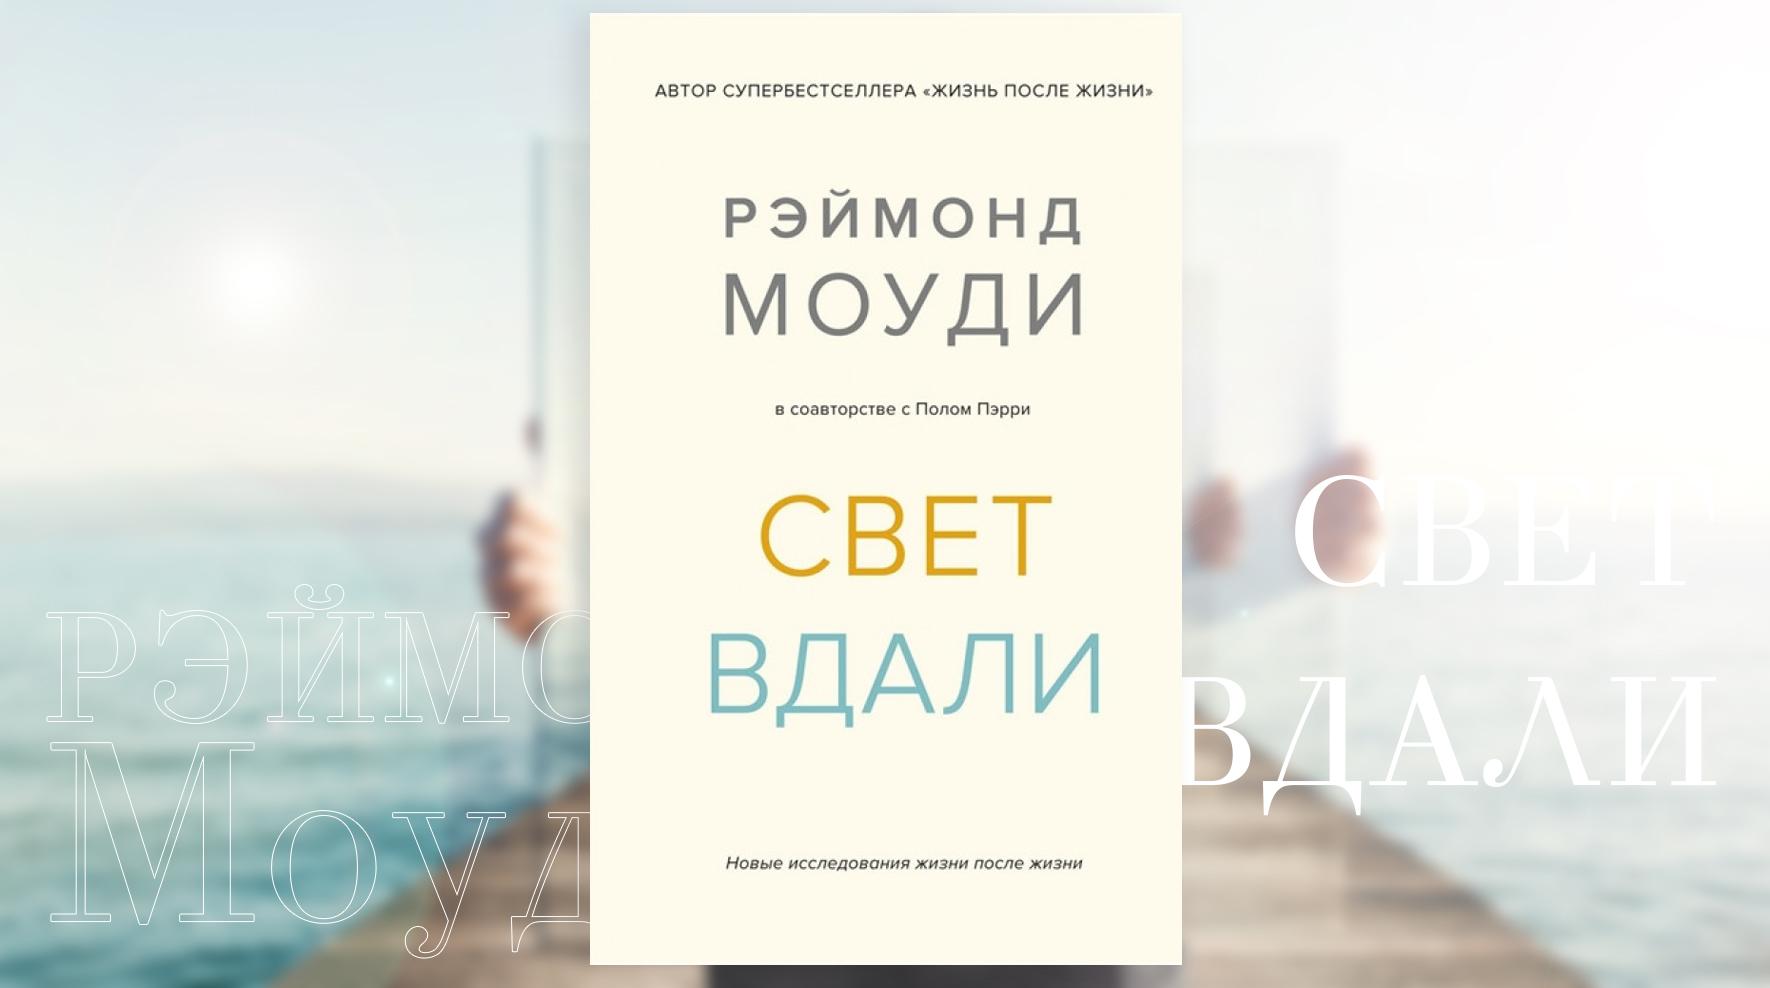 Книга, Свет вдали, Реймонд Моуди, 978-5-389-16652-3